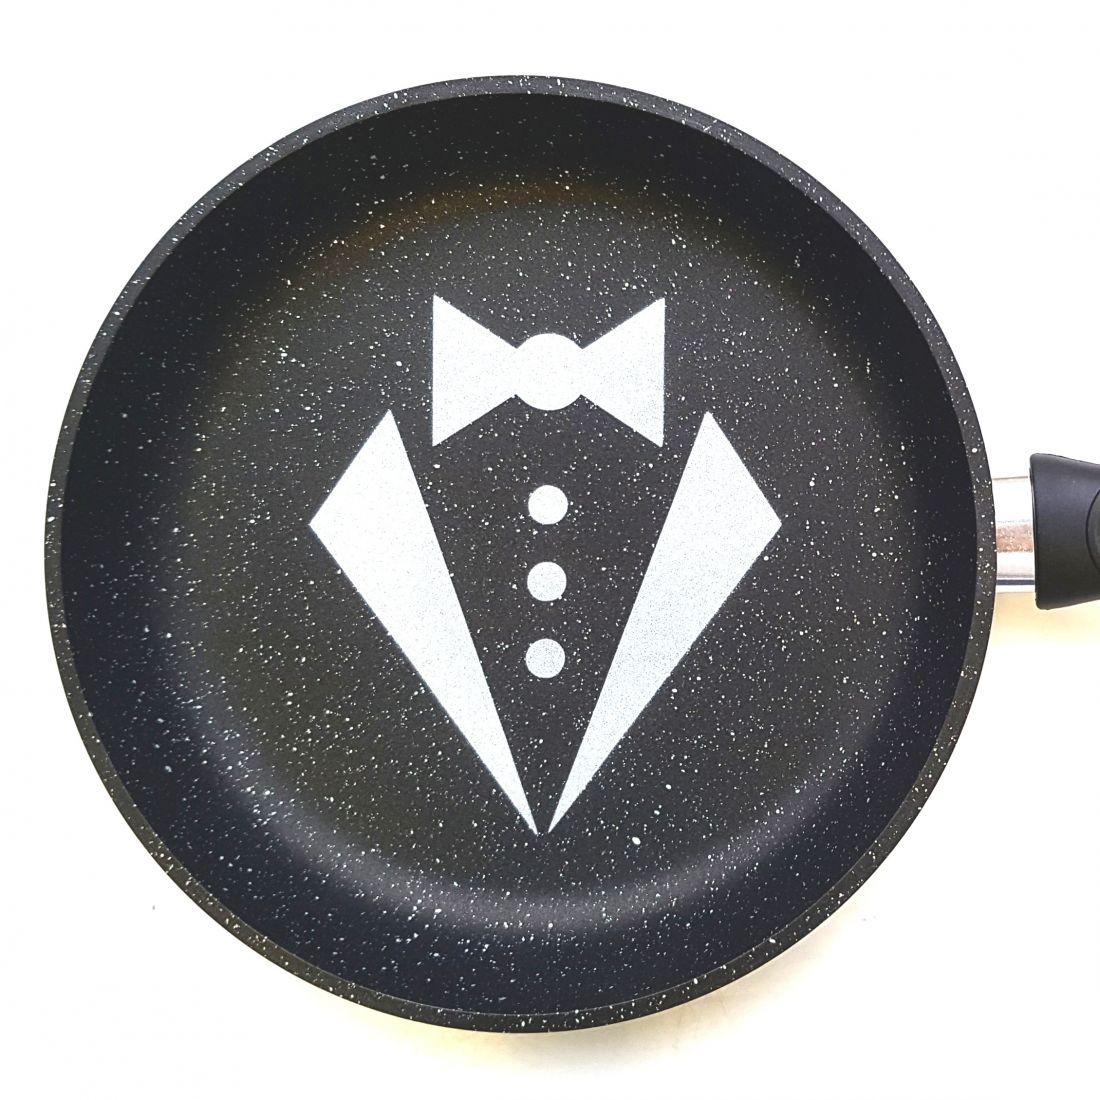 Сковорода 24 см. с логотипом Смокинг